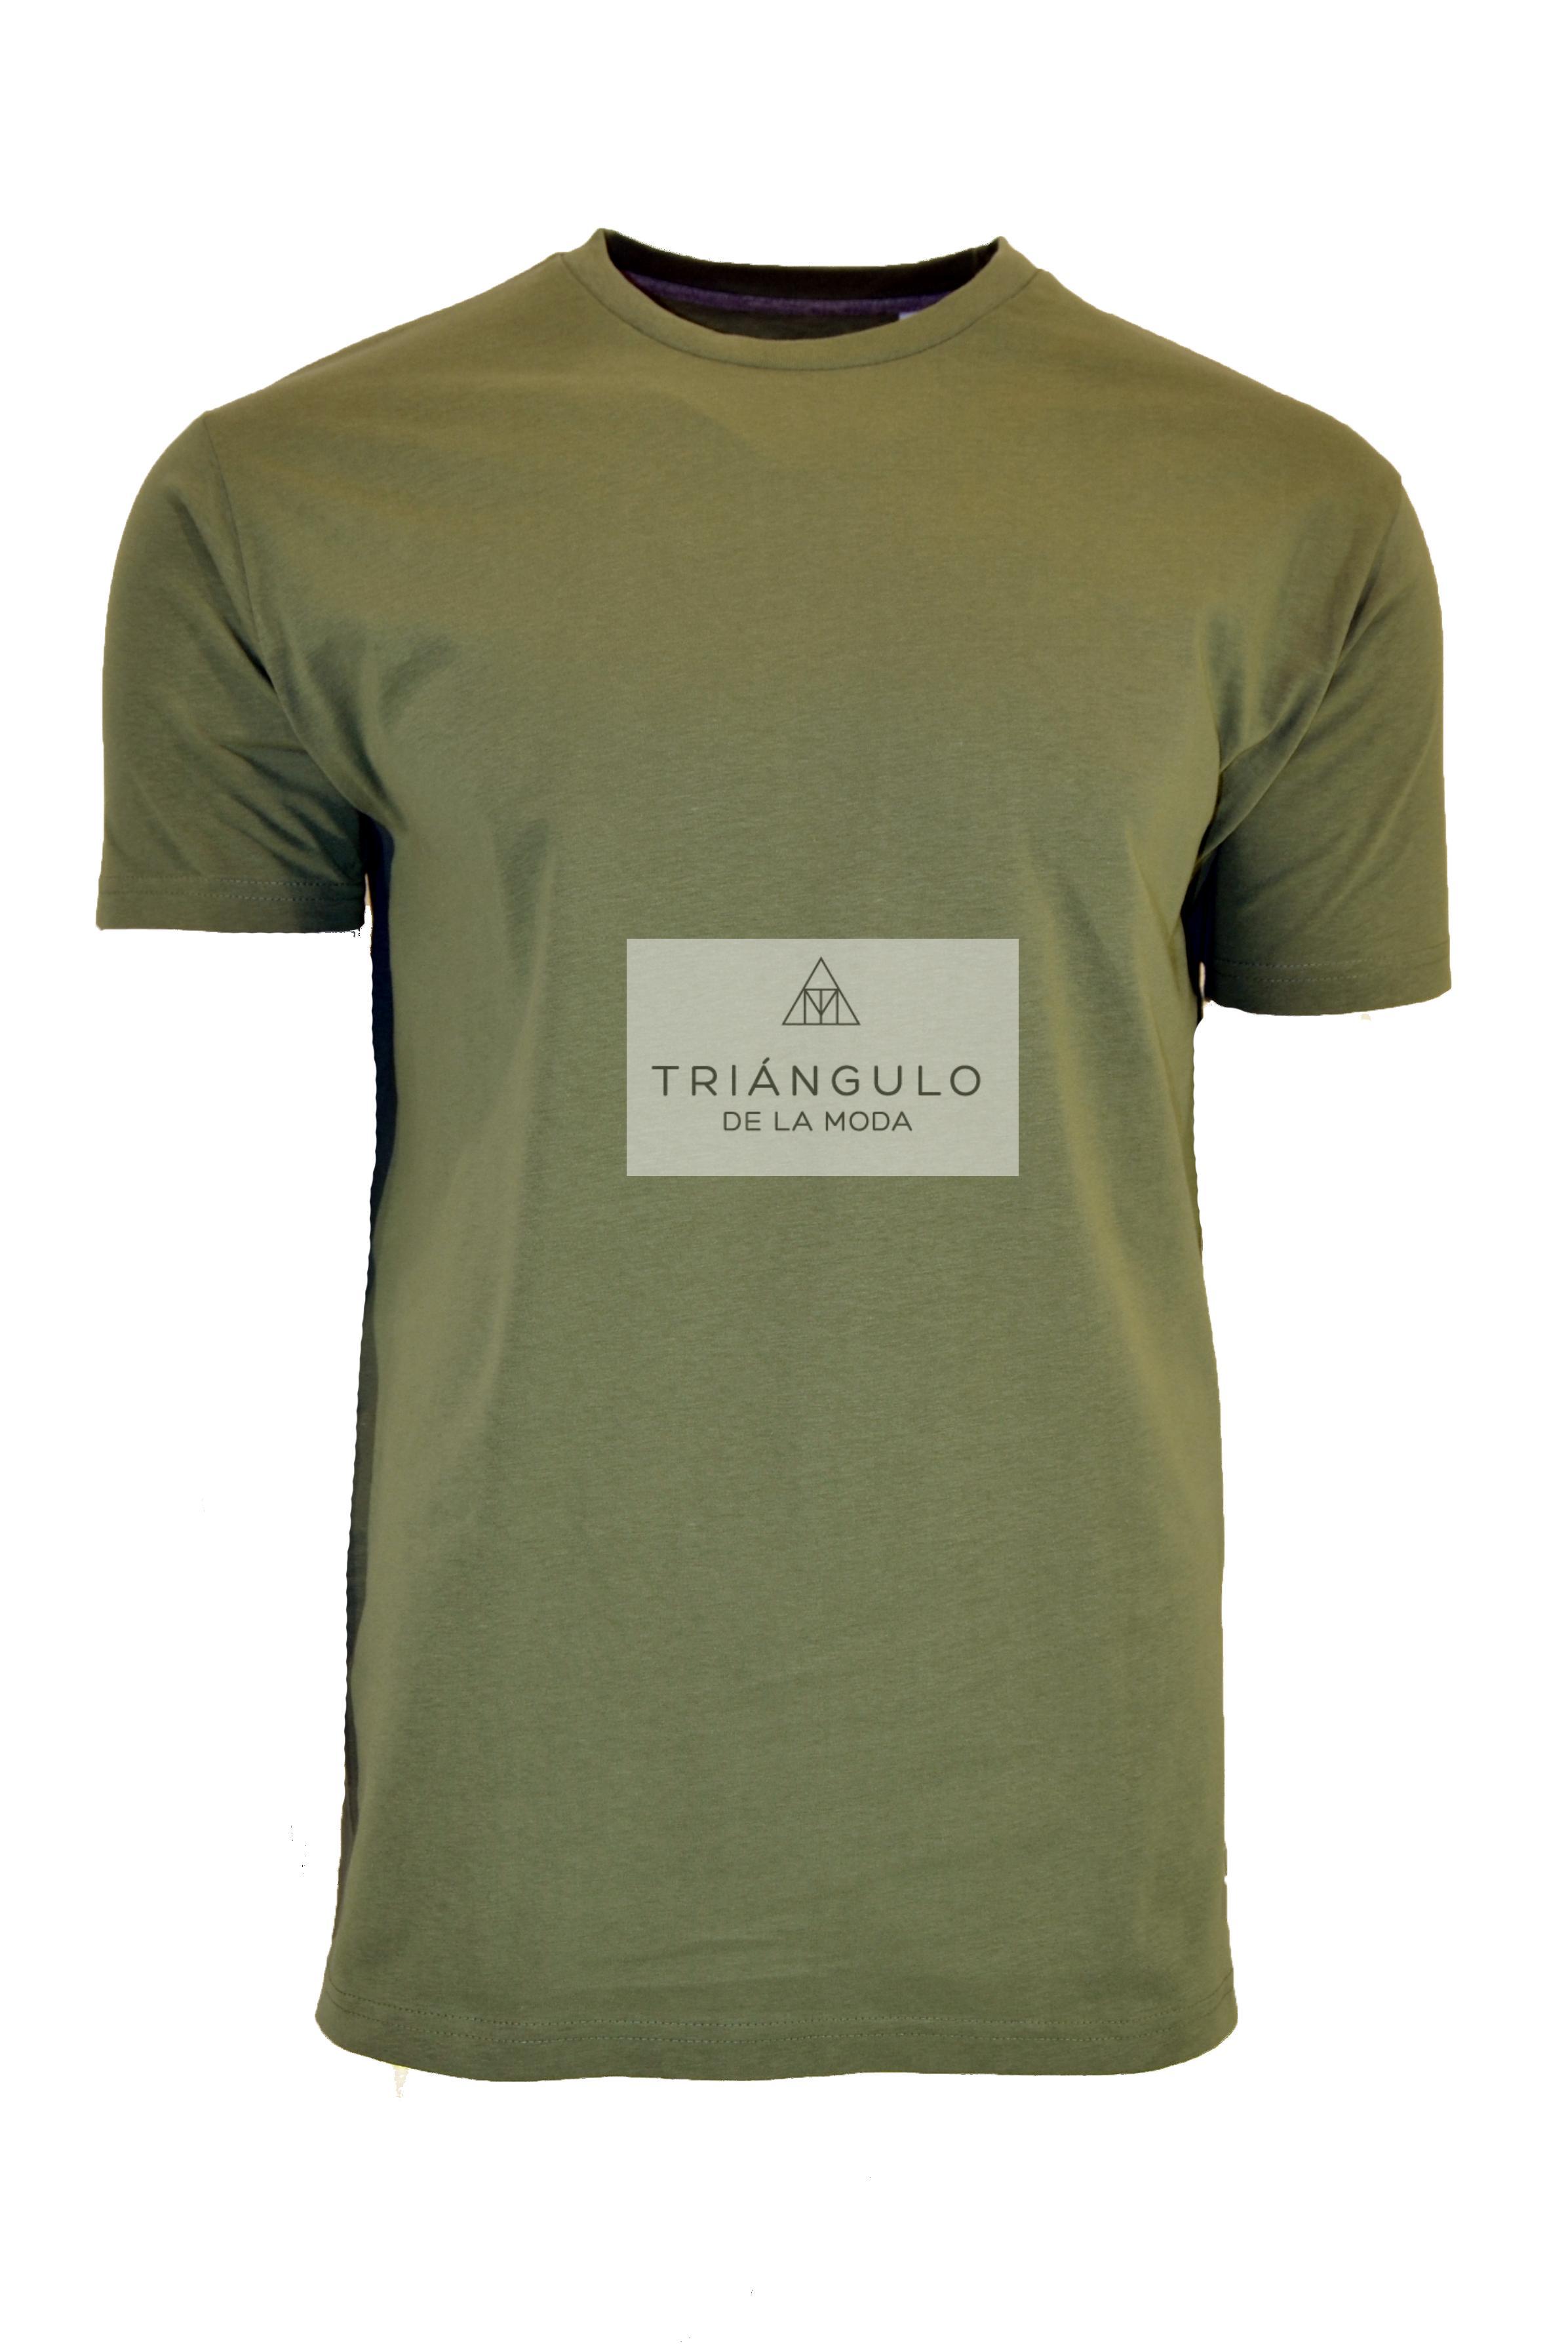 Tienda online del Triangulo de la Moda CAMISETA MANGA CORTA